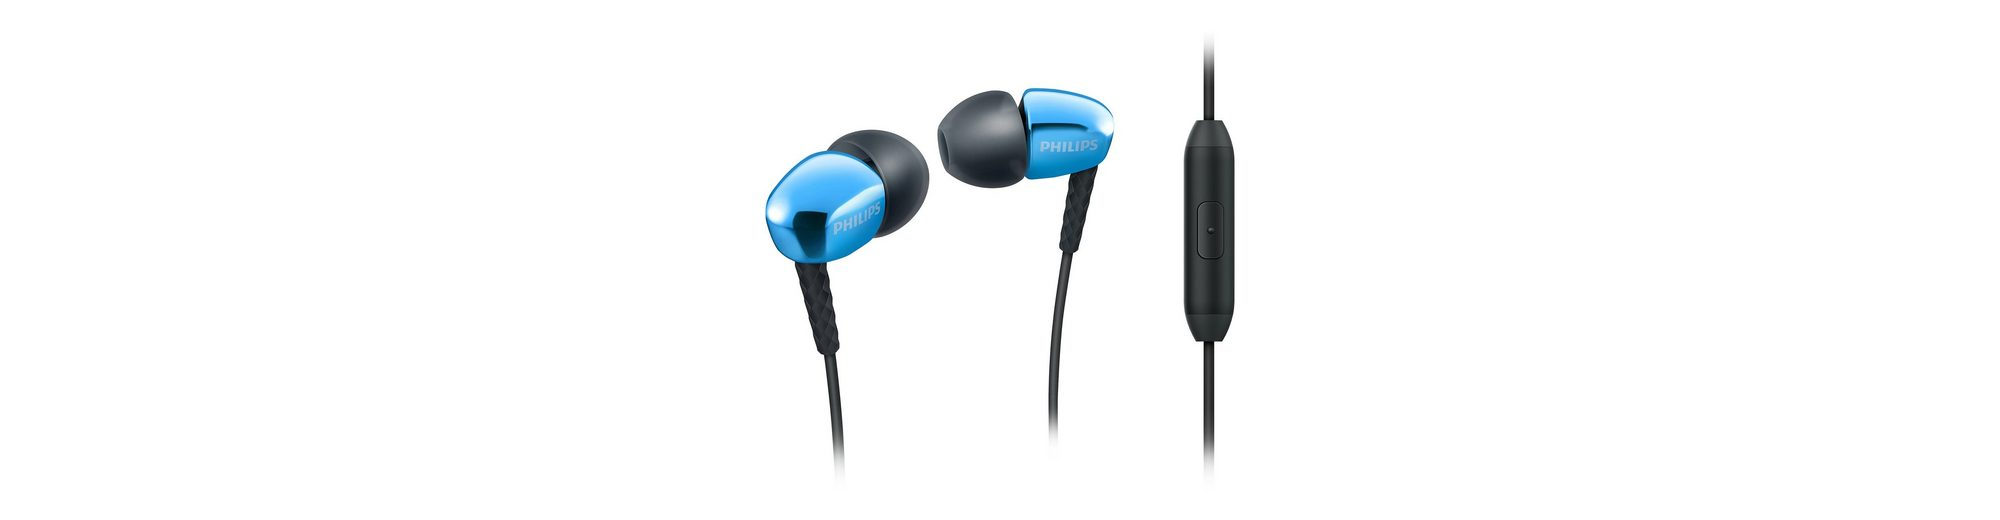 Philips InEar Headset Kopfhörer »SHE3905/00 blau«